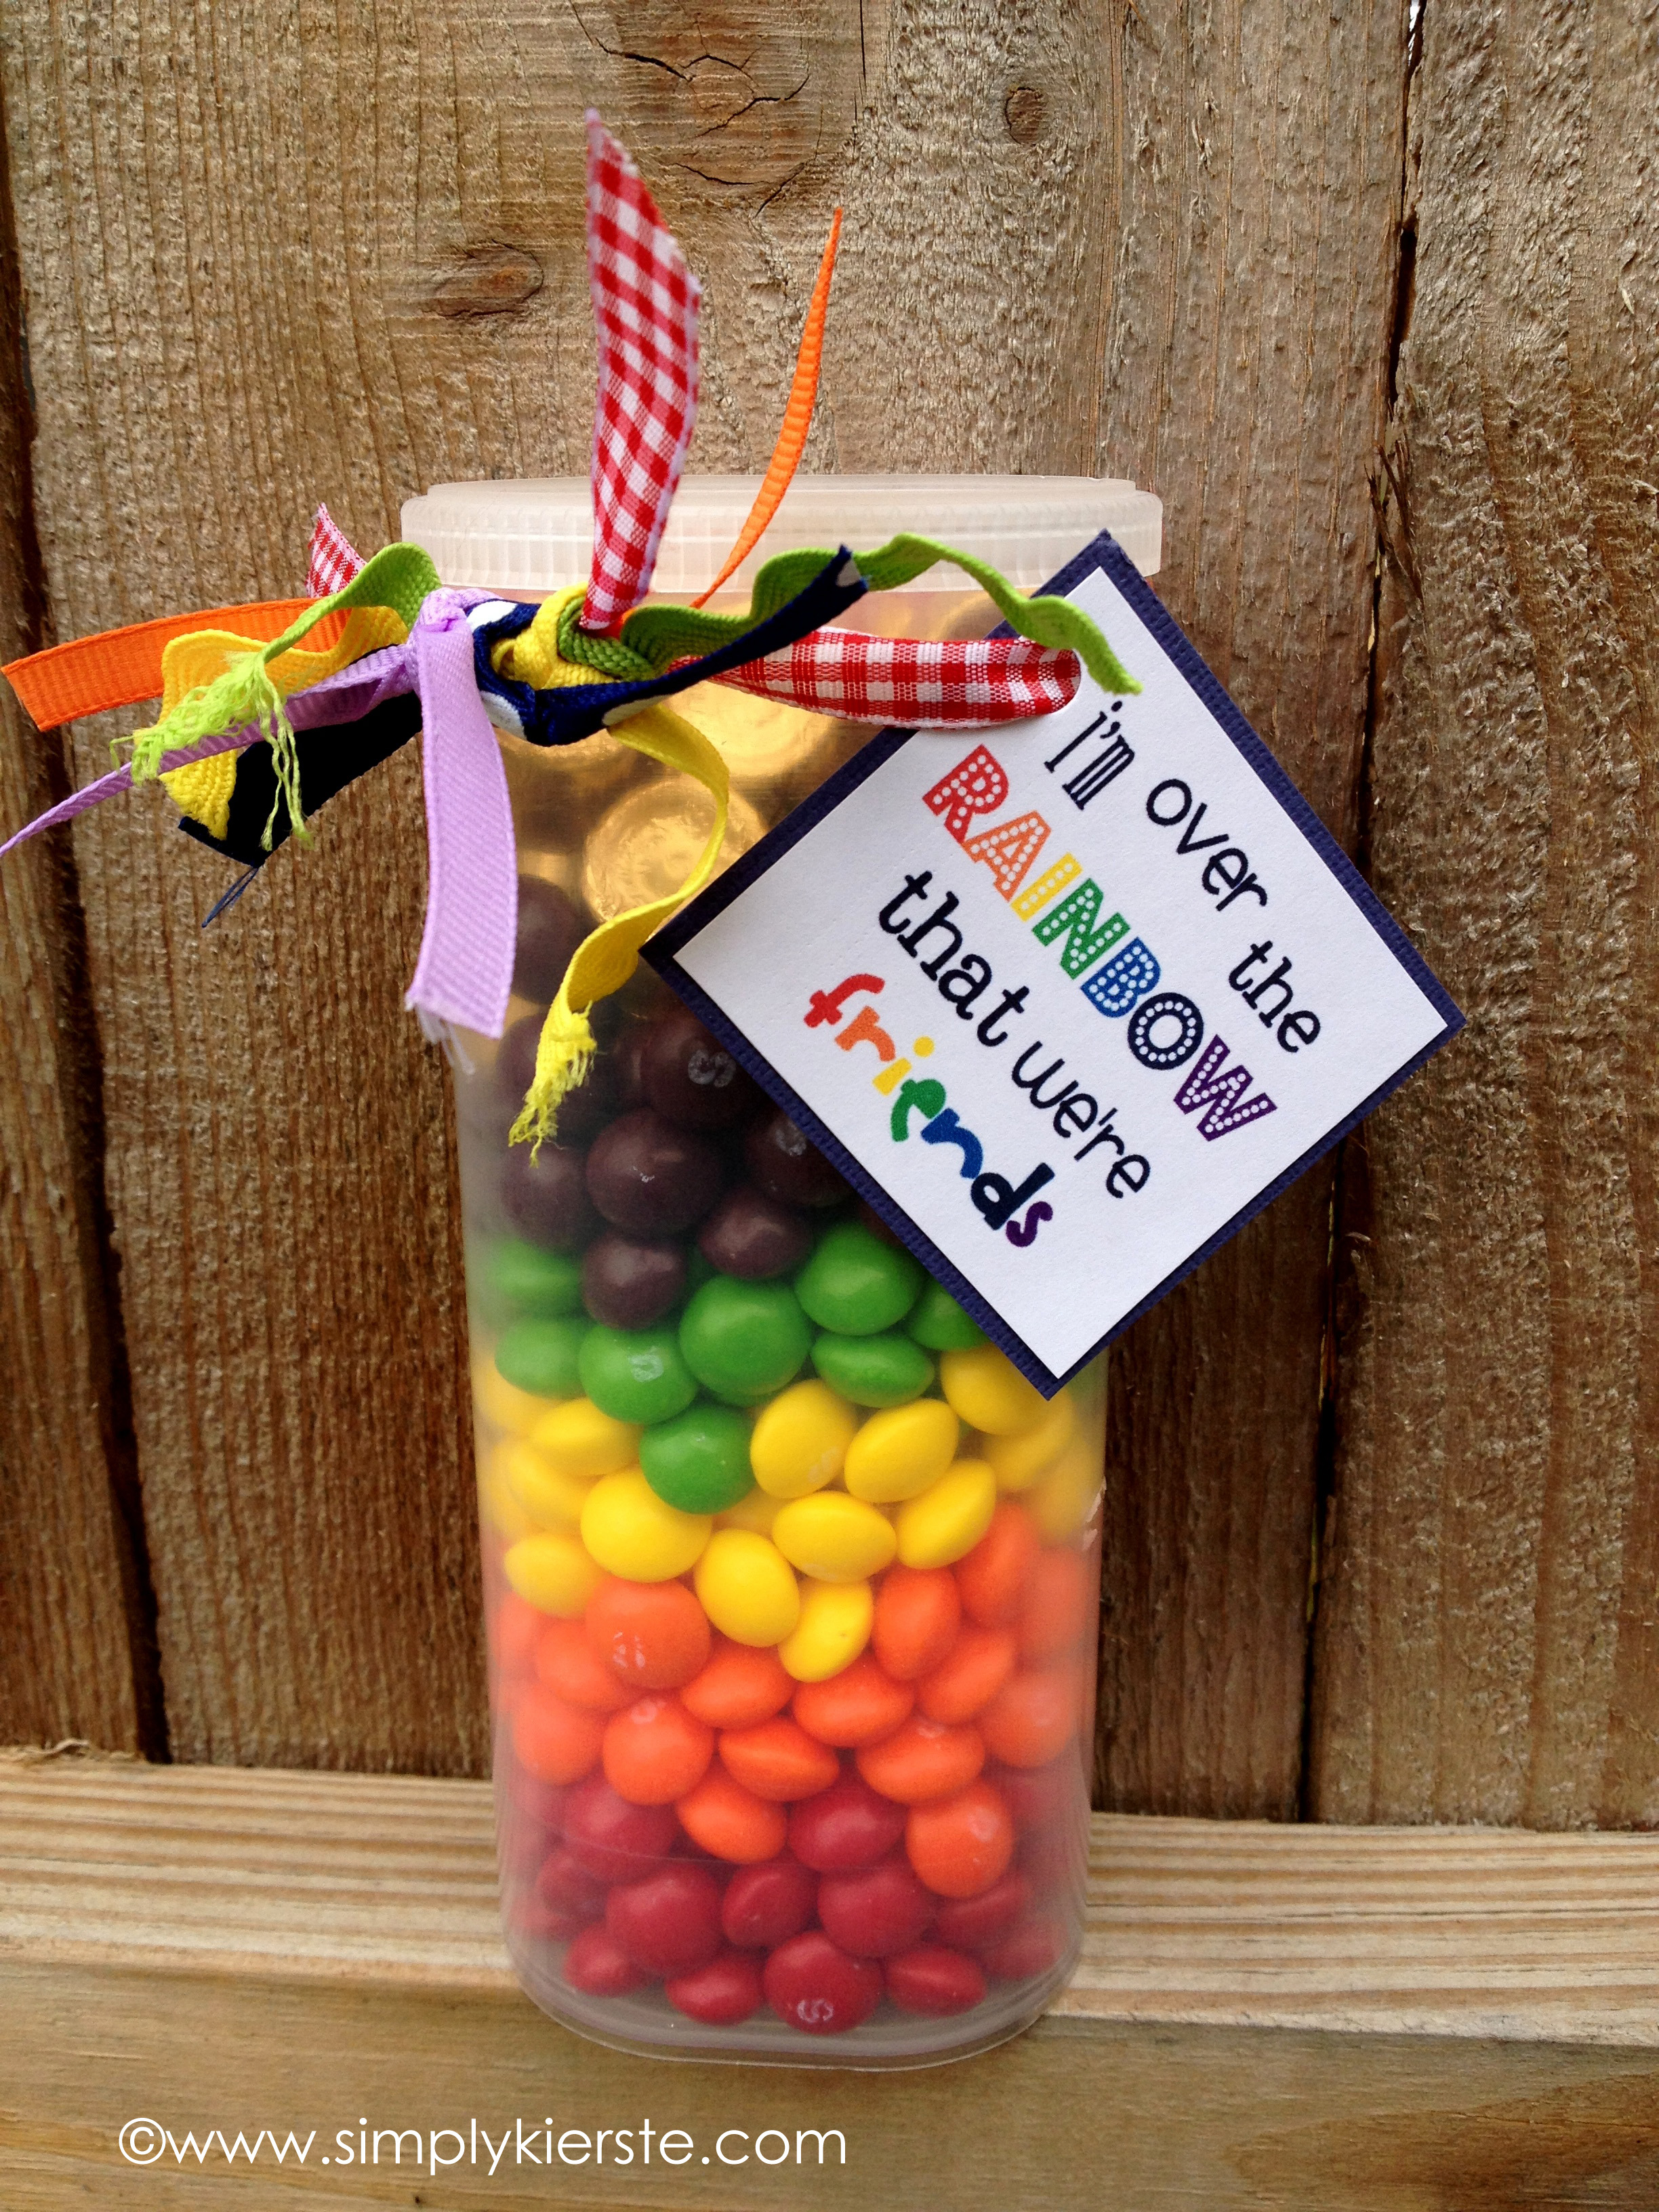 Over the Rainbow | St. Patrick's Day Printable | simplykierste.com